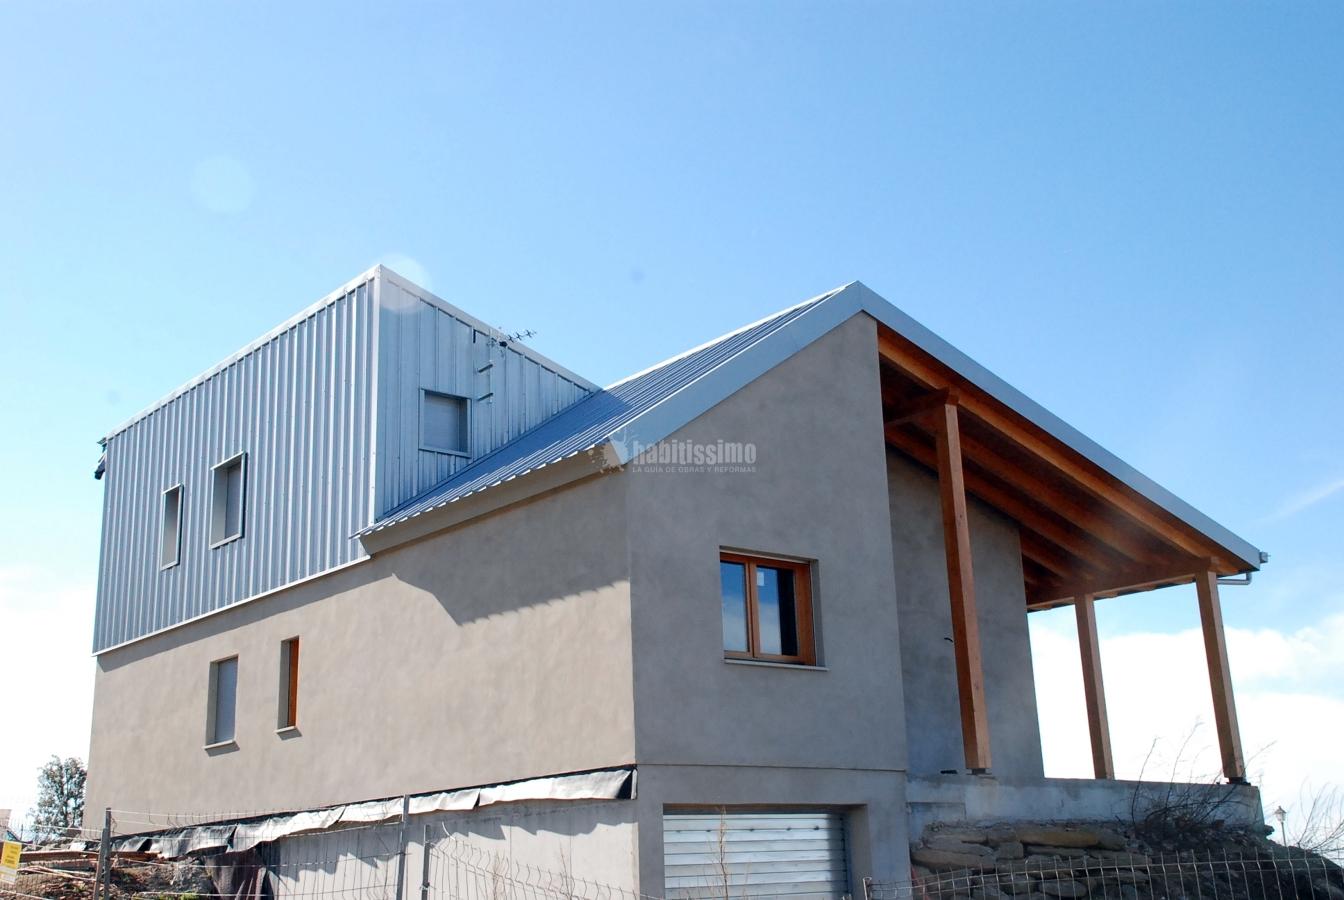 Casa con estructura de madera ideas arquitectos - Casas con estructura de madera ...